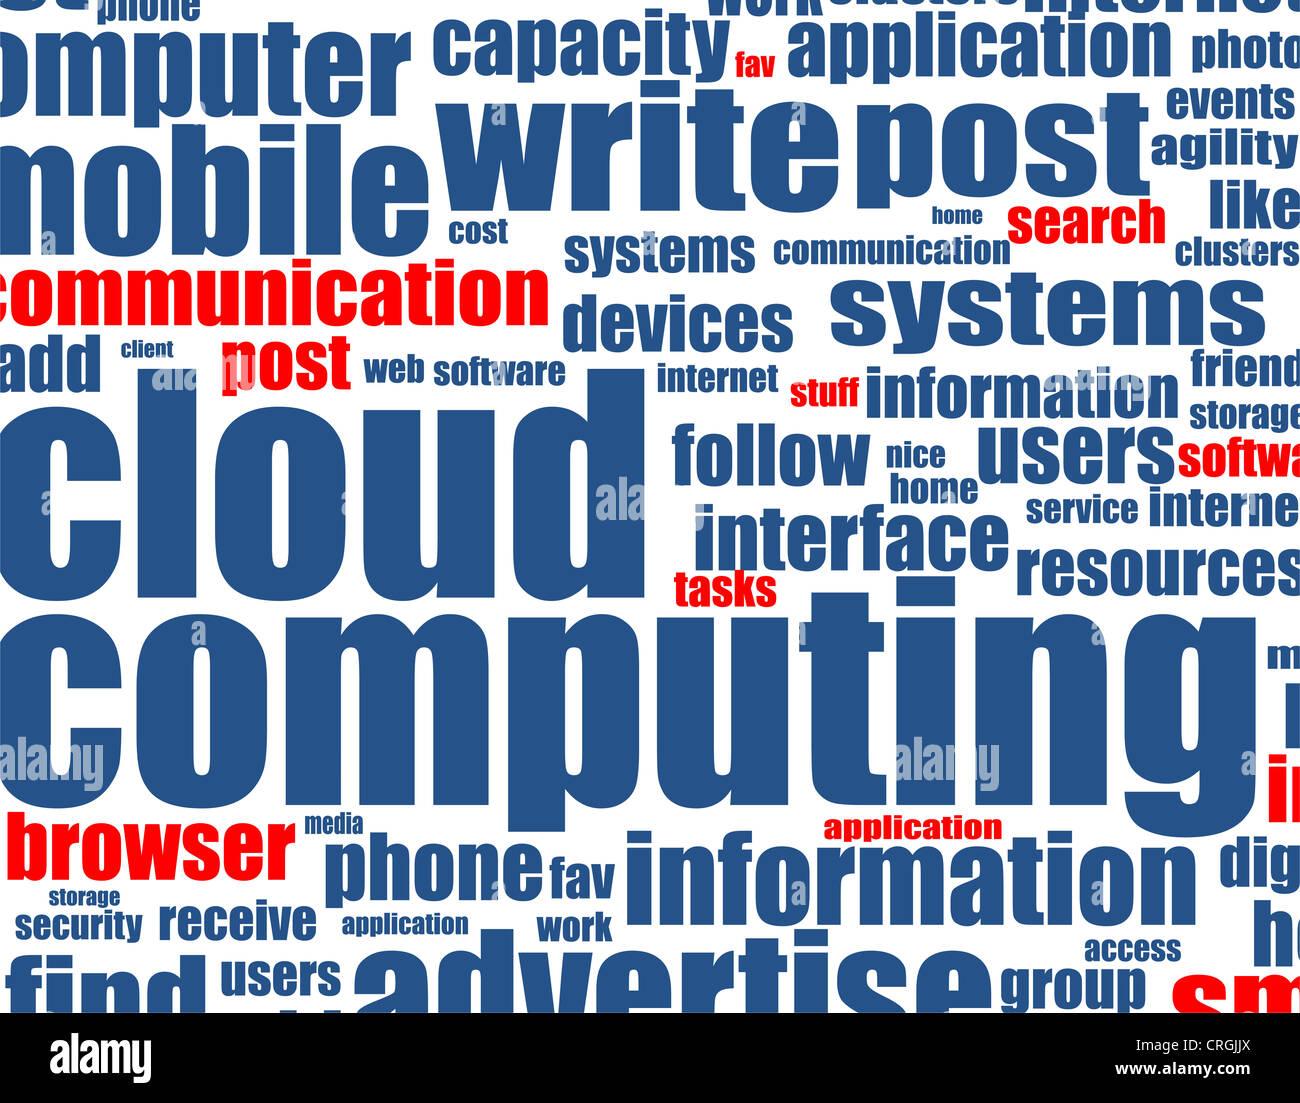 Cloud computing - mot Contexte Photo Stock